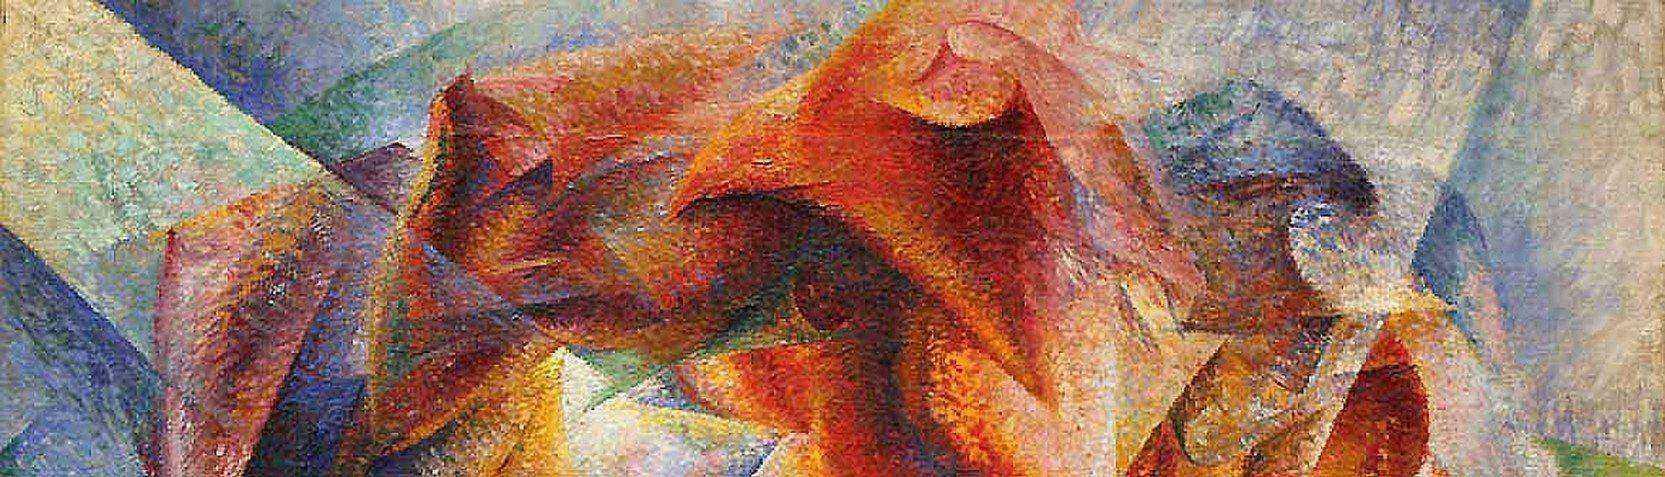 Artistes - Umberto Boccioni